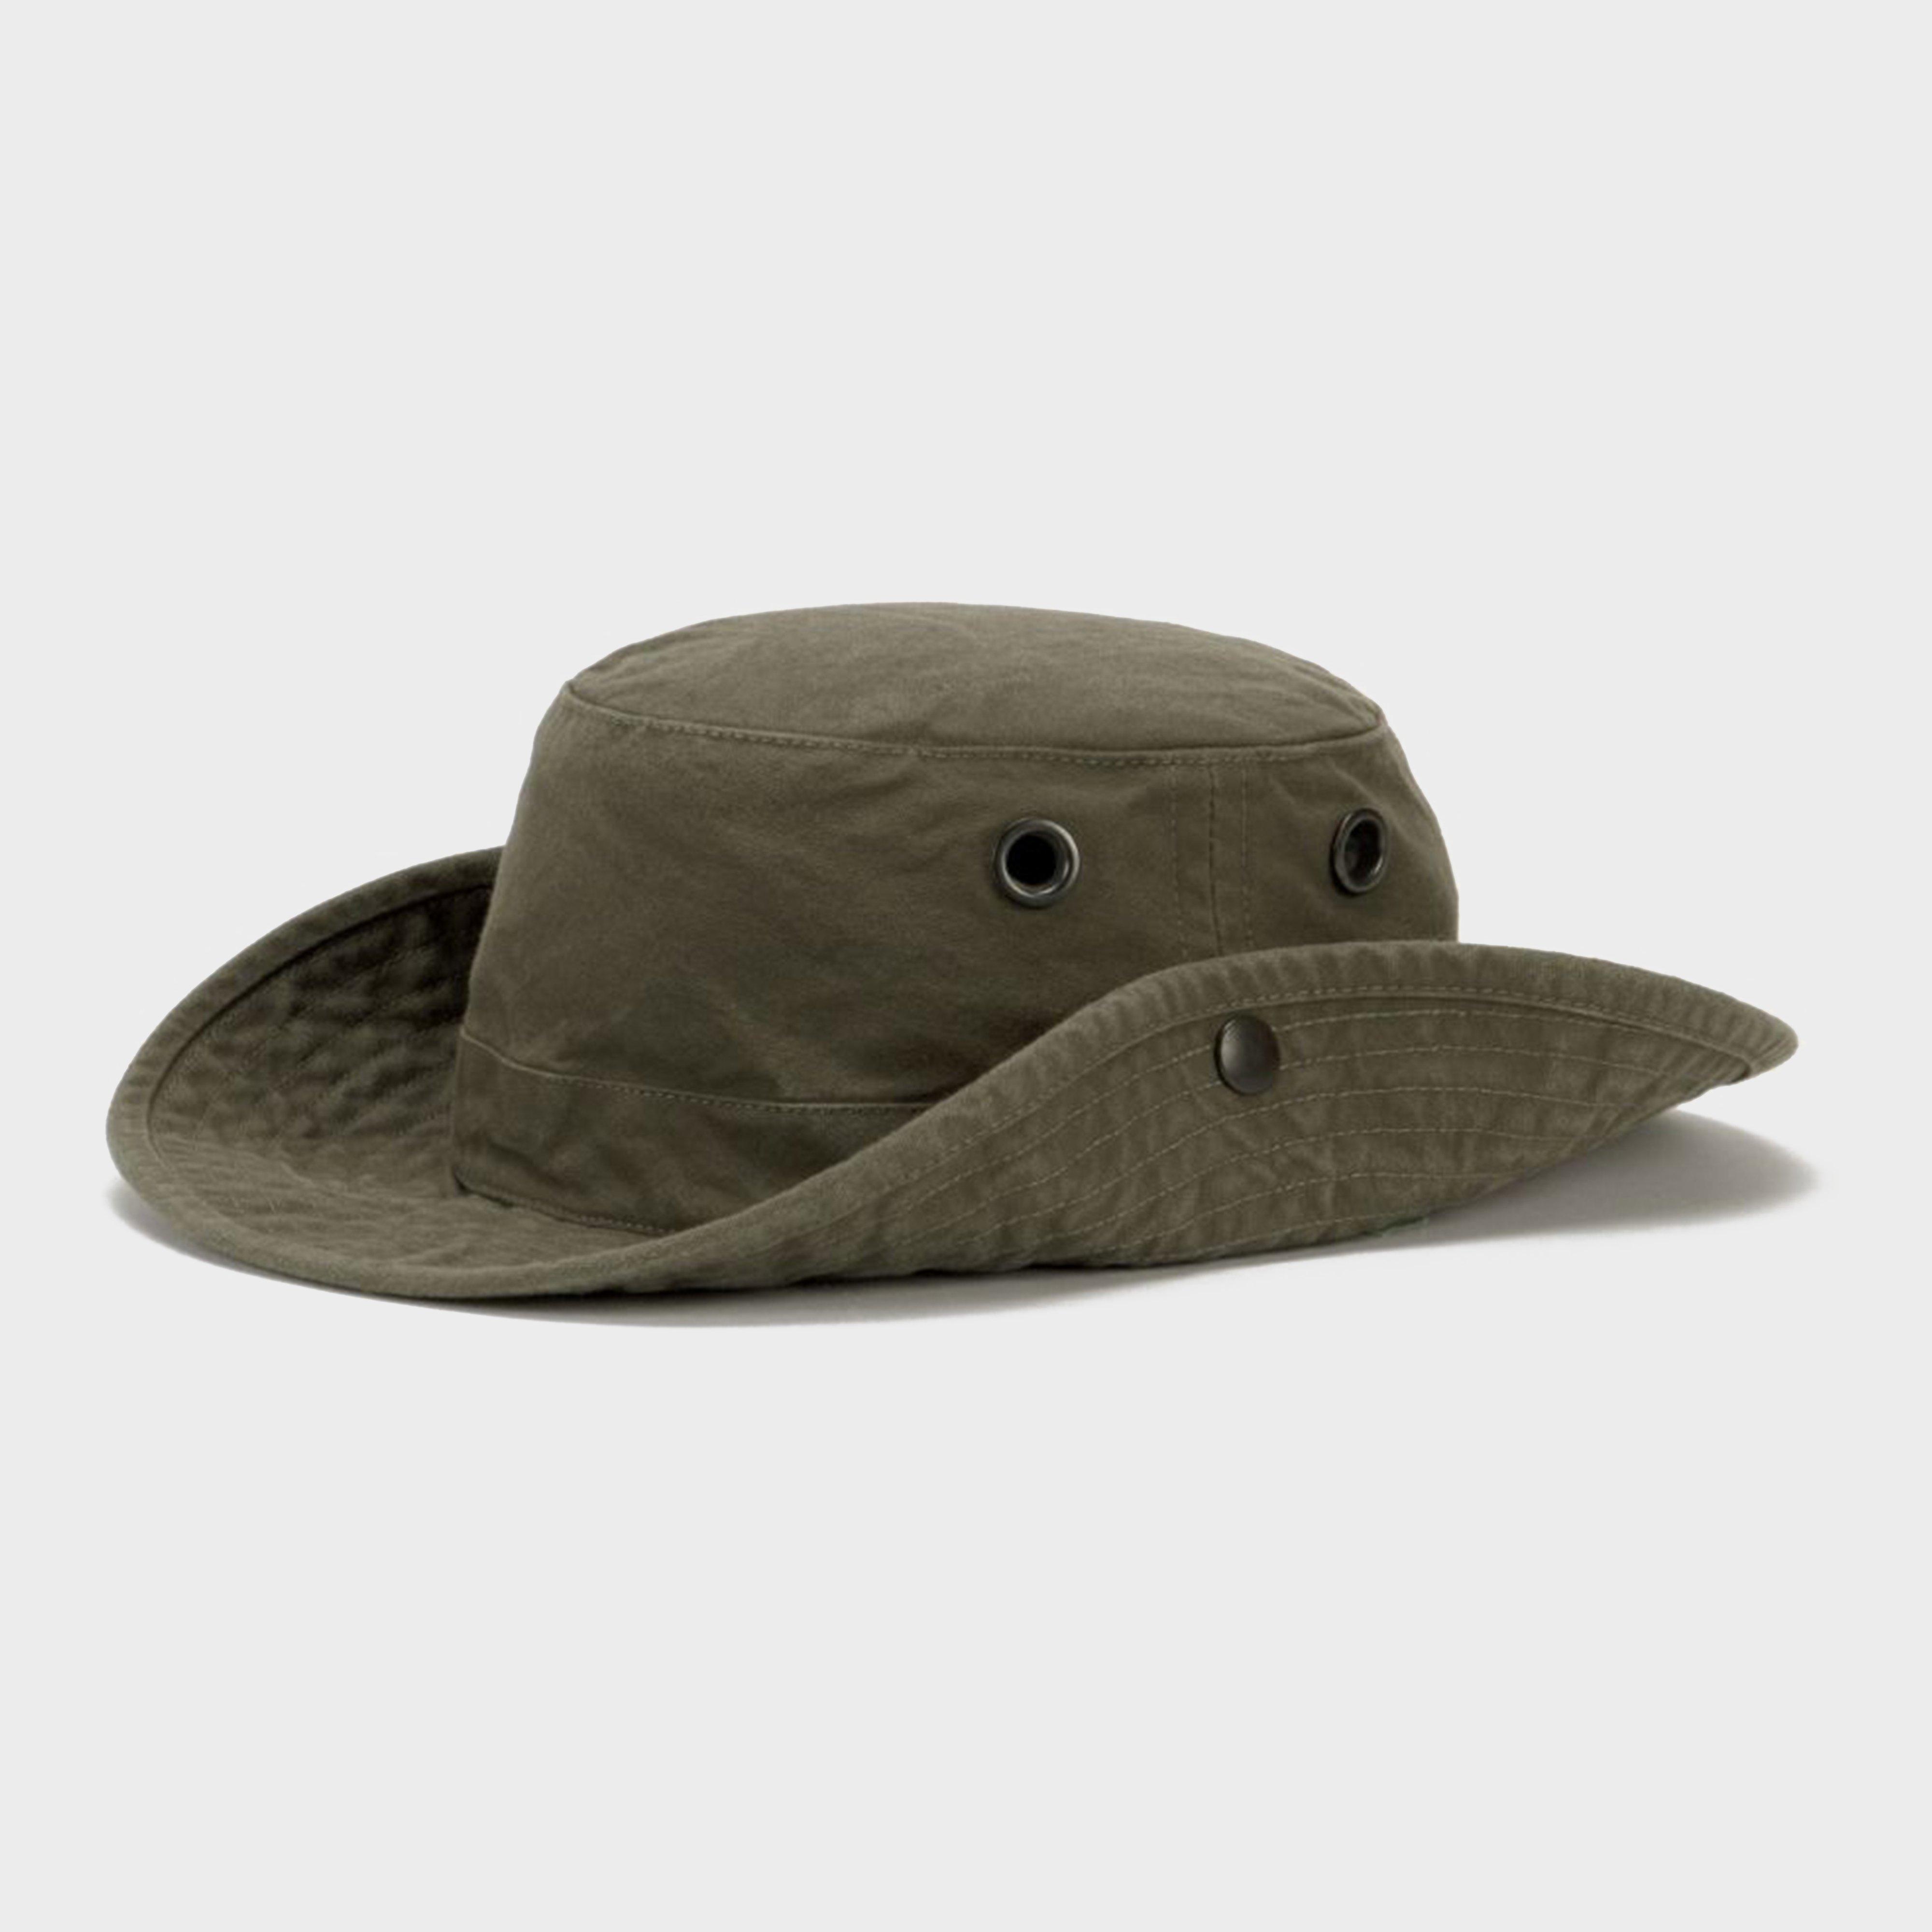 Tilley T3 Wanderer Hat 0308e6cce32